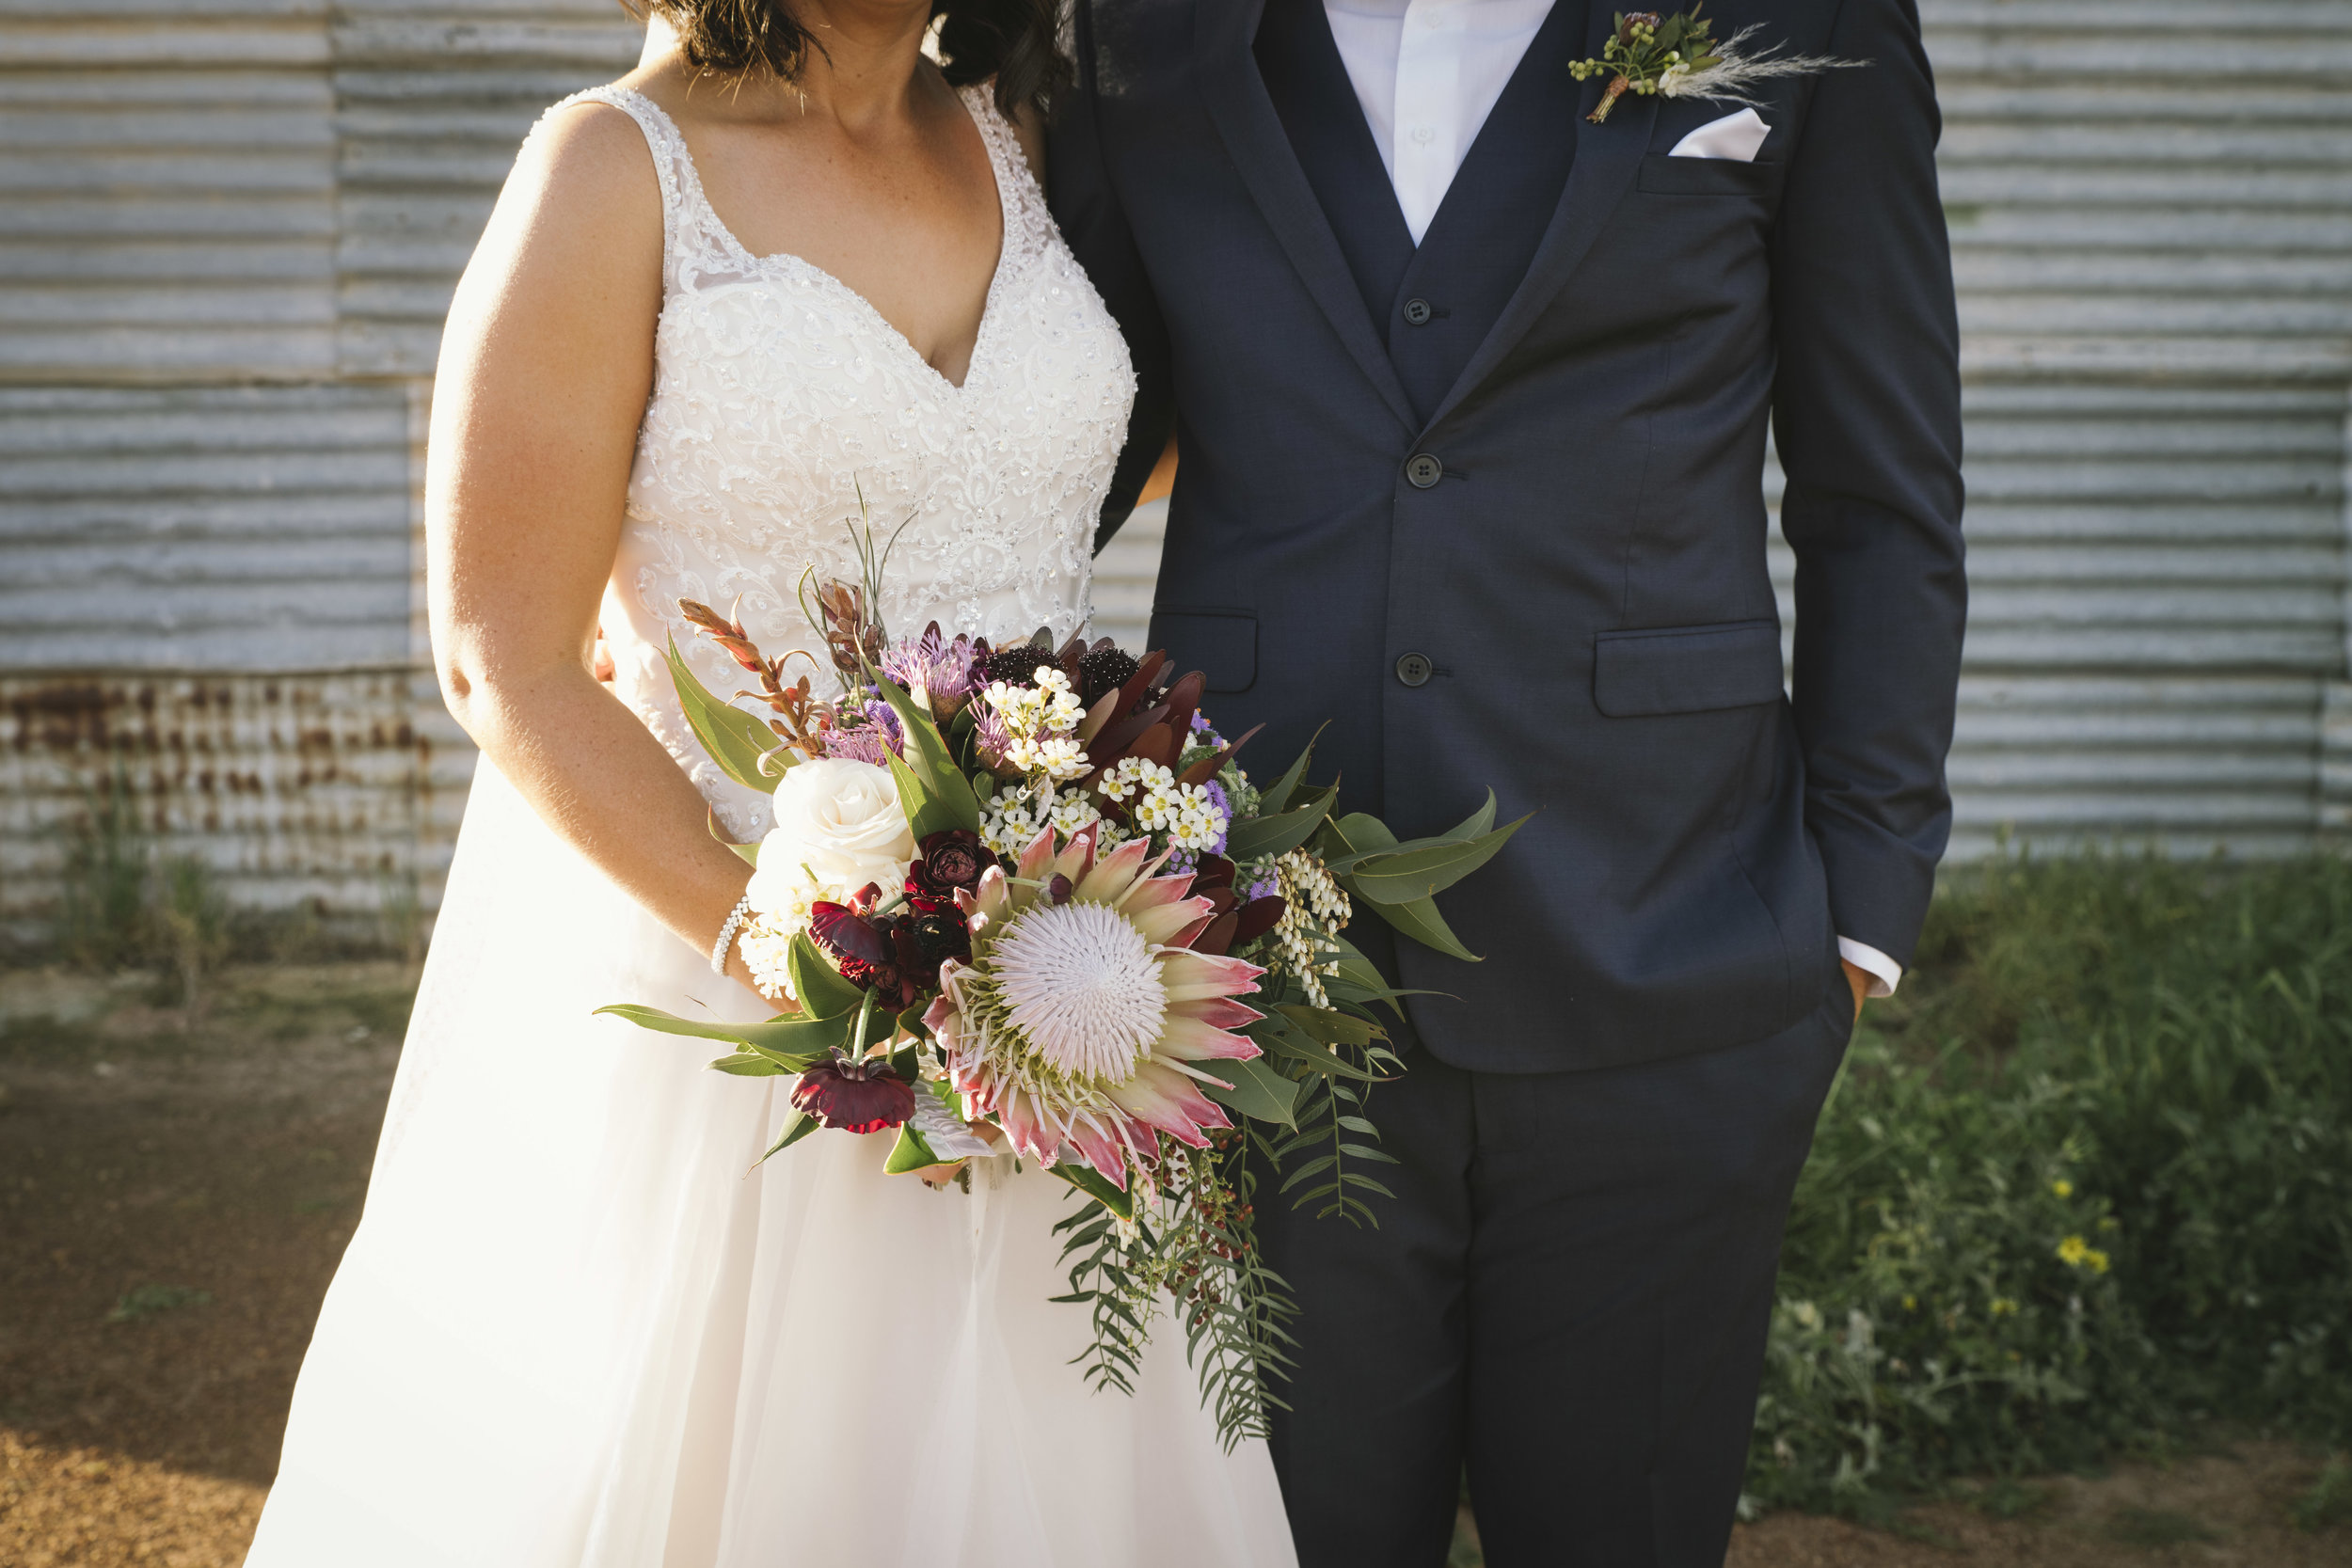 Angie Roe Photography Wheatbelt Avon Valley Farm Wedding (47).jpg